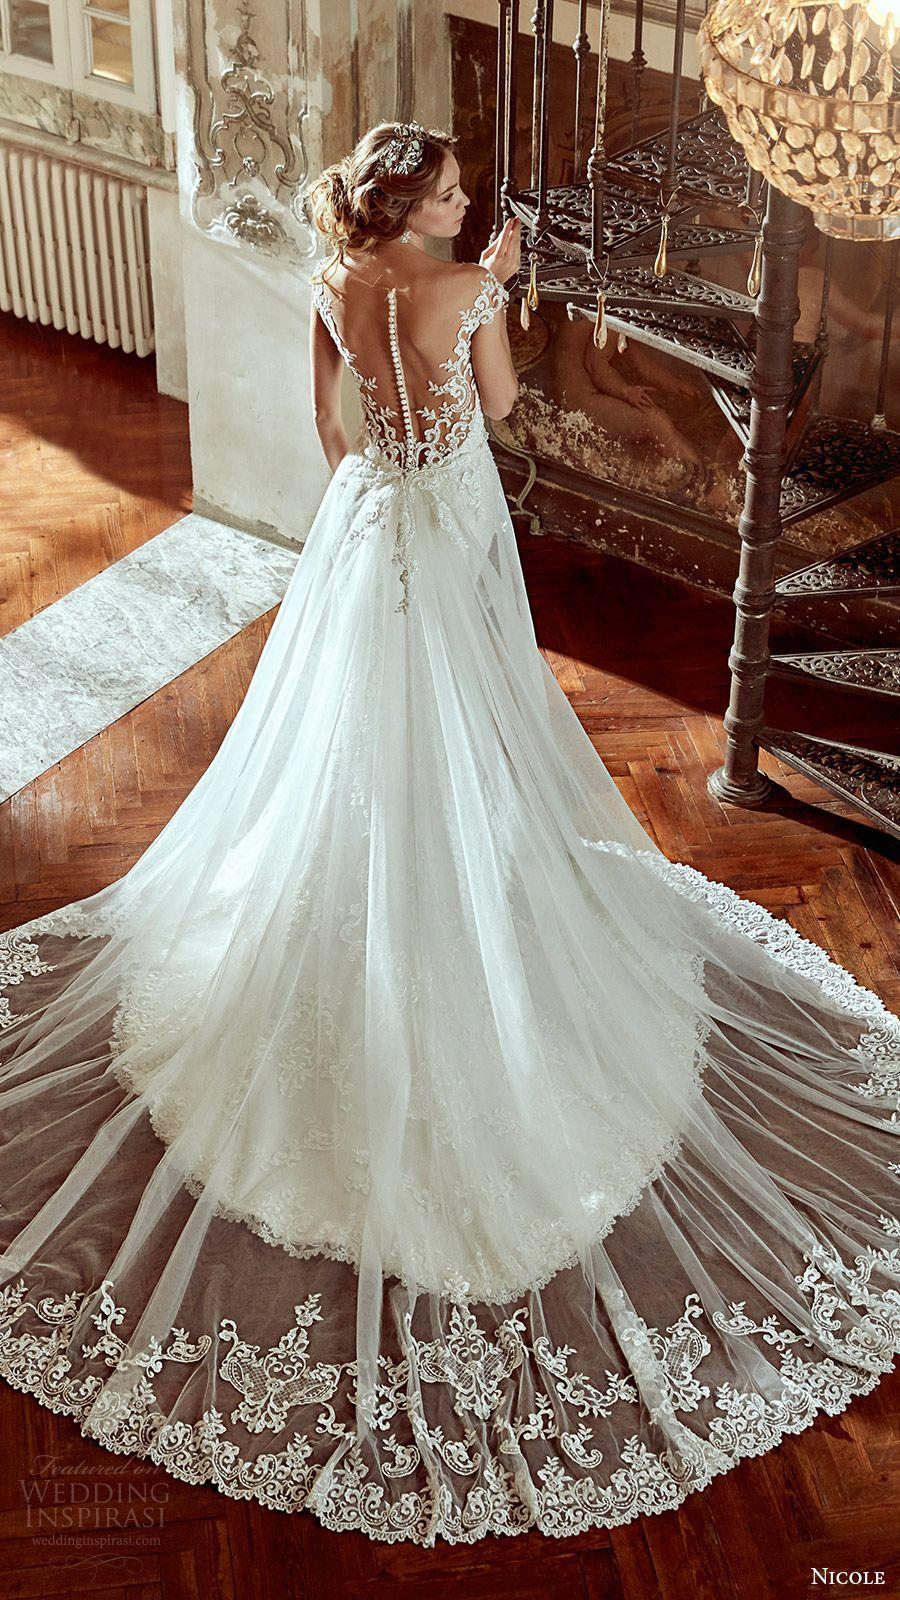 Nicole spose bridal cap sleeve sweetheart neckline aline